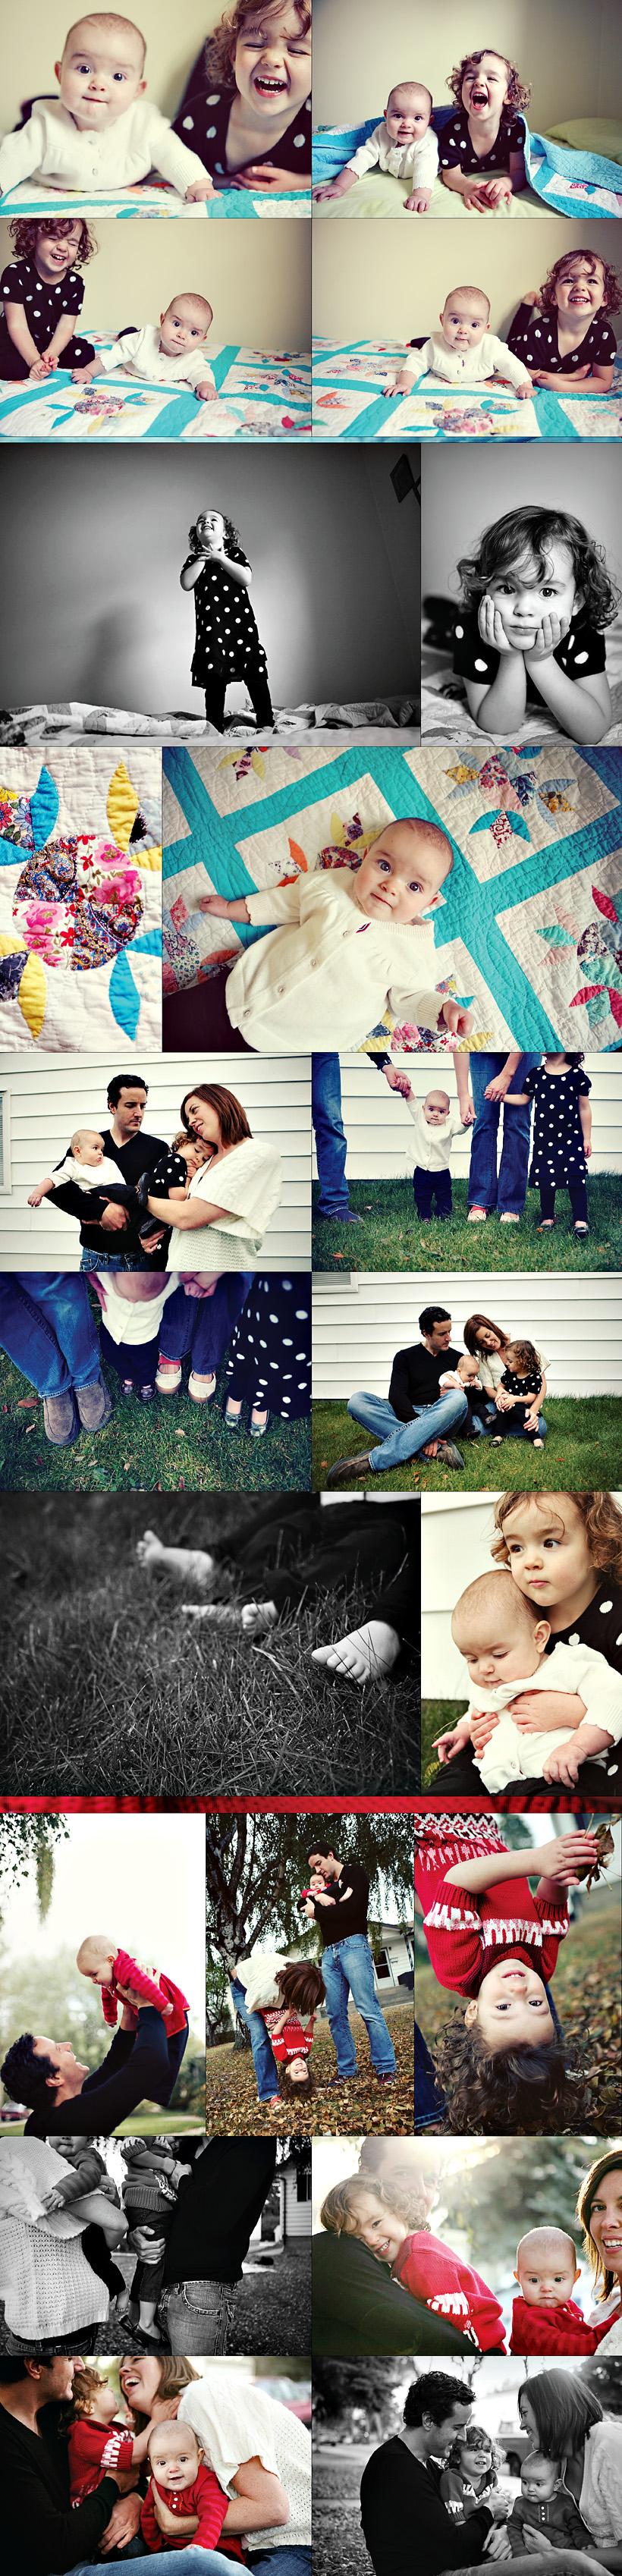 edmonton family photographer